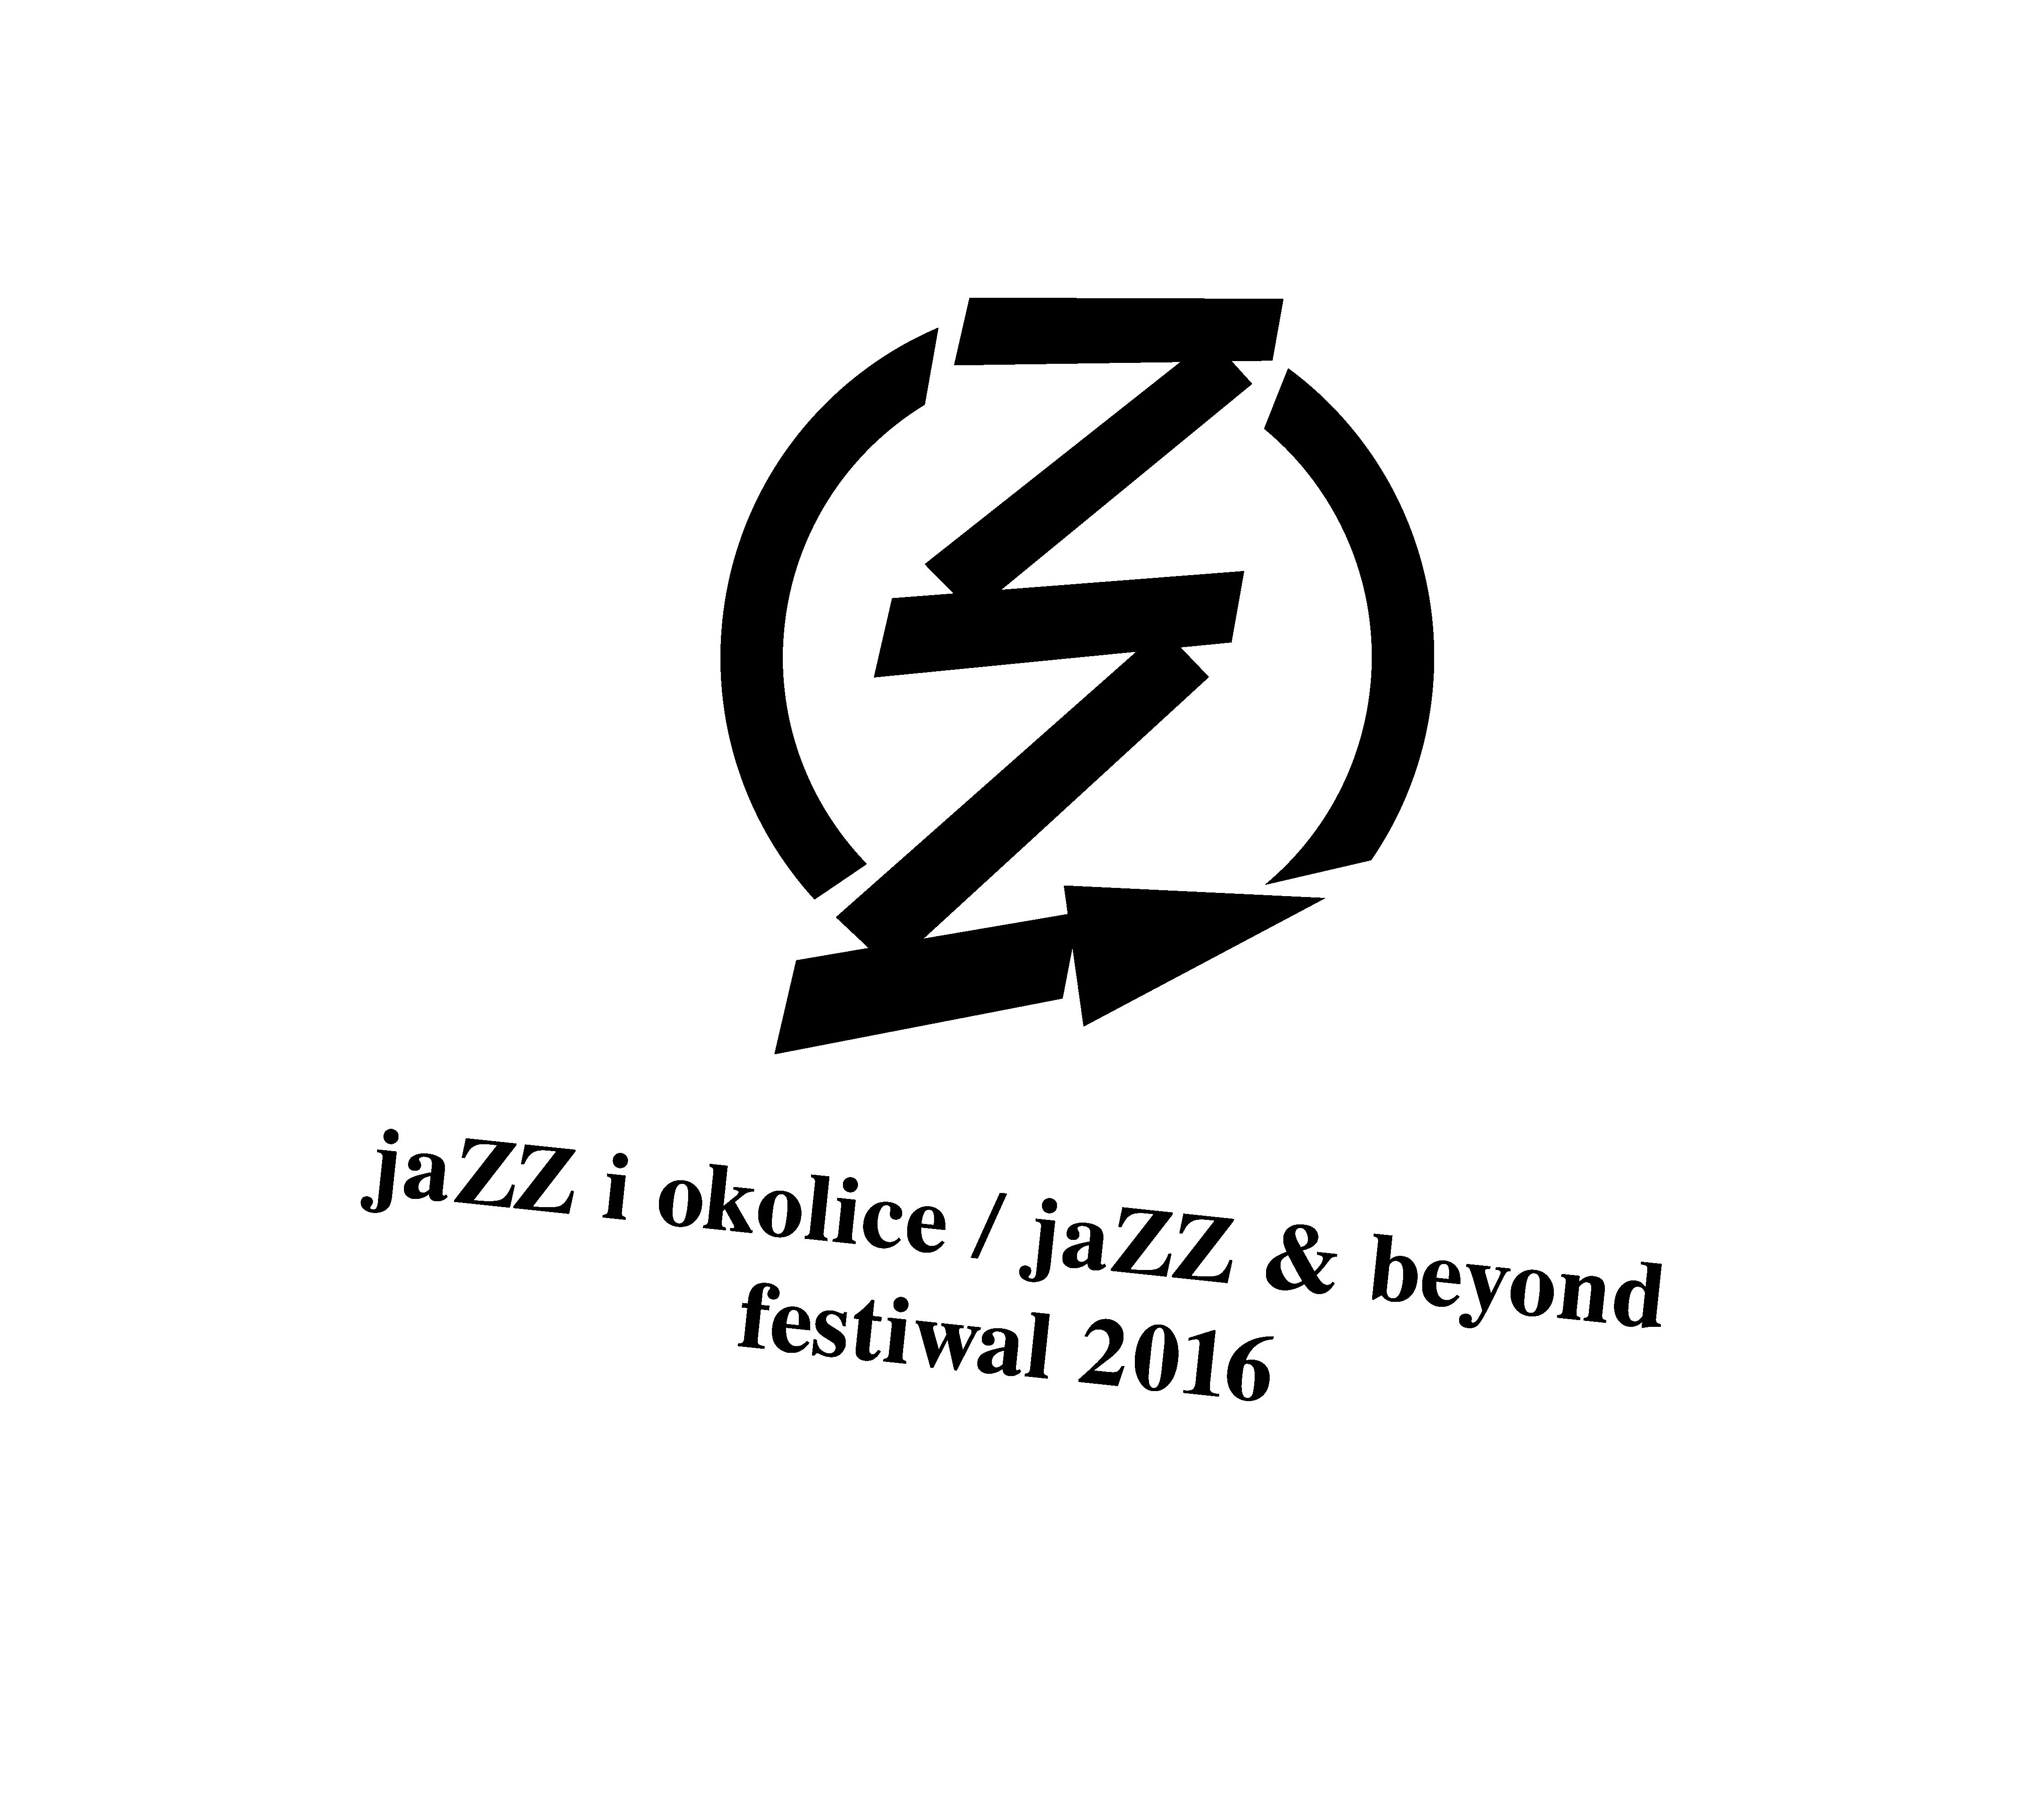 jazziok_logo_2016-12